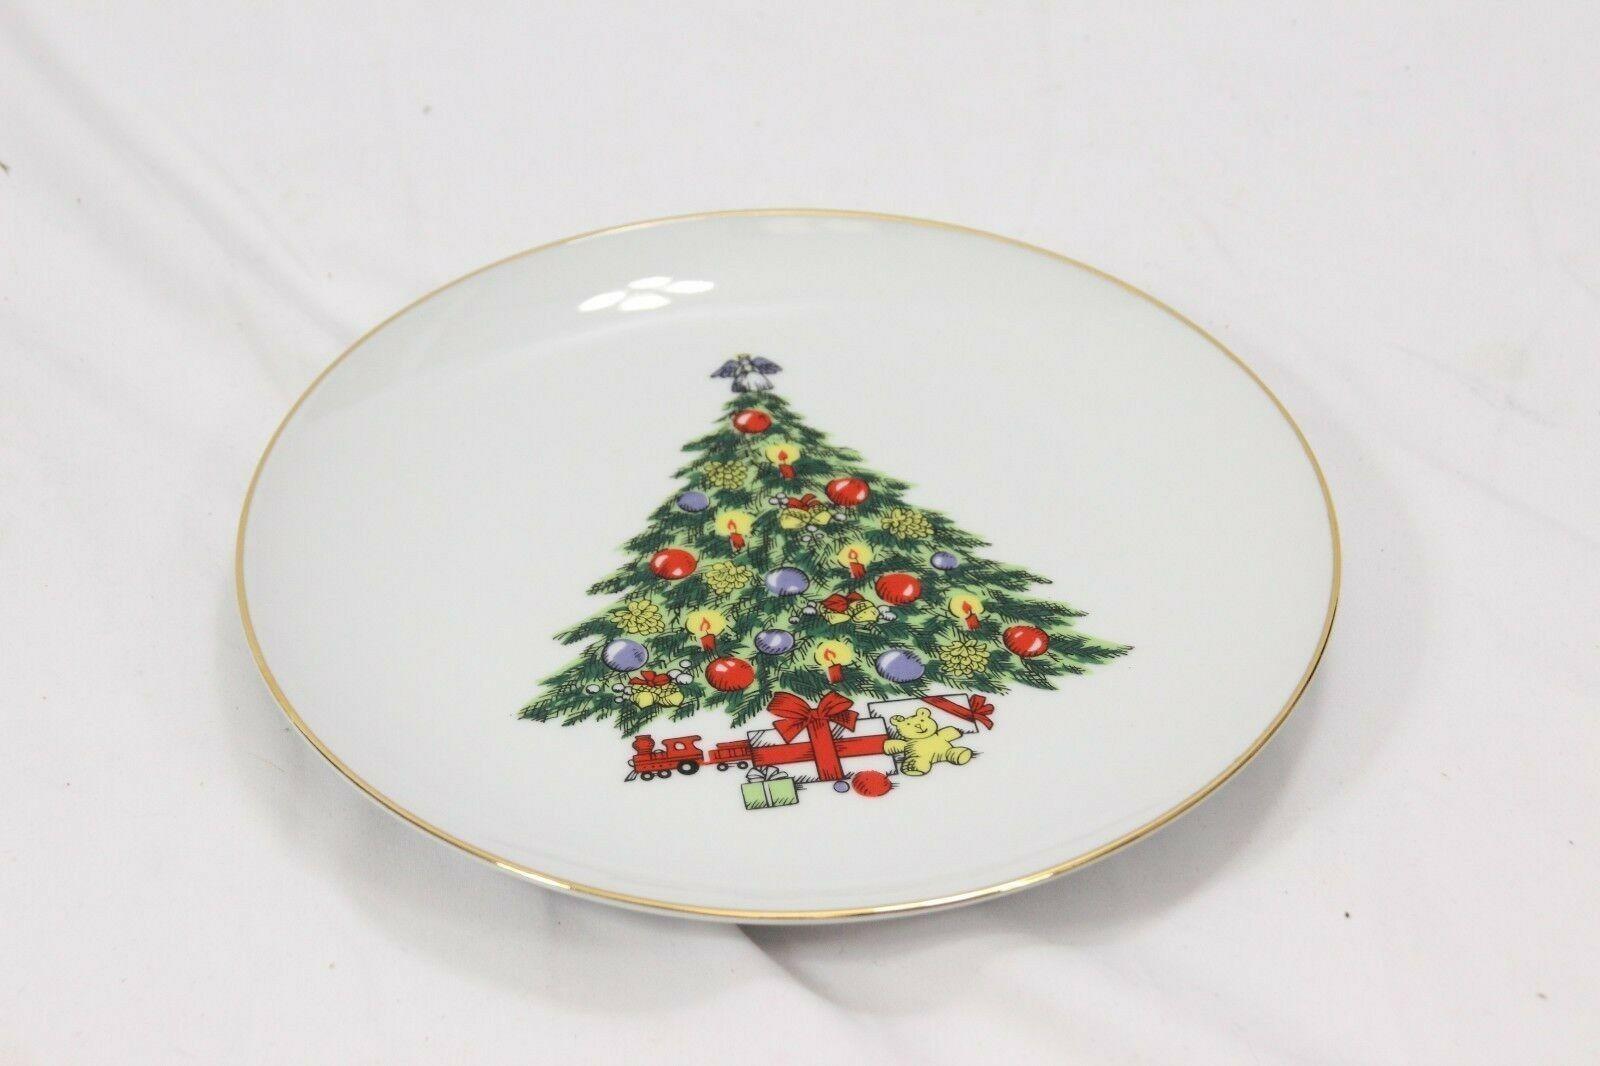 Jamestown Xmas Treasure Dinner and Salad Plates Lot of 8 image 8